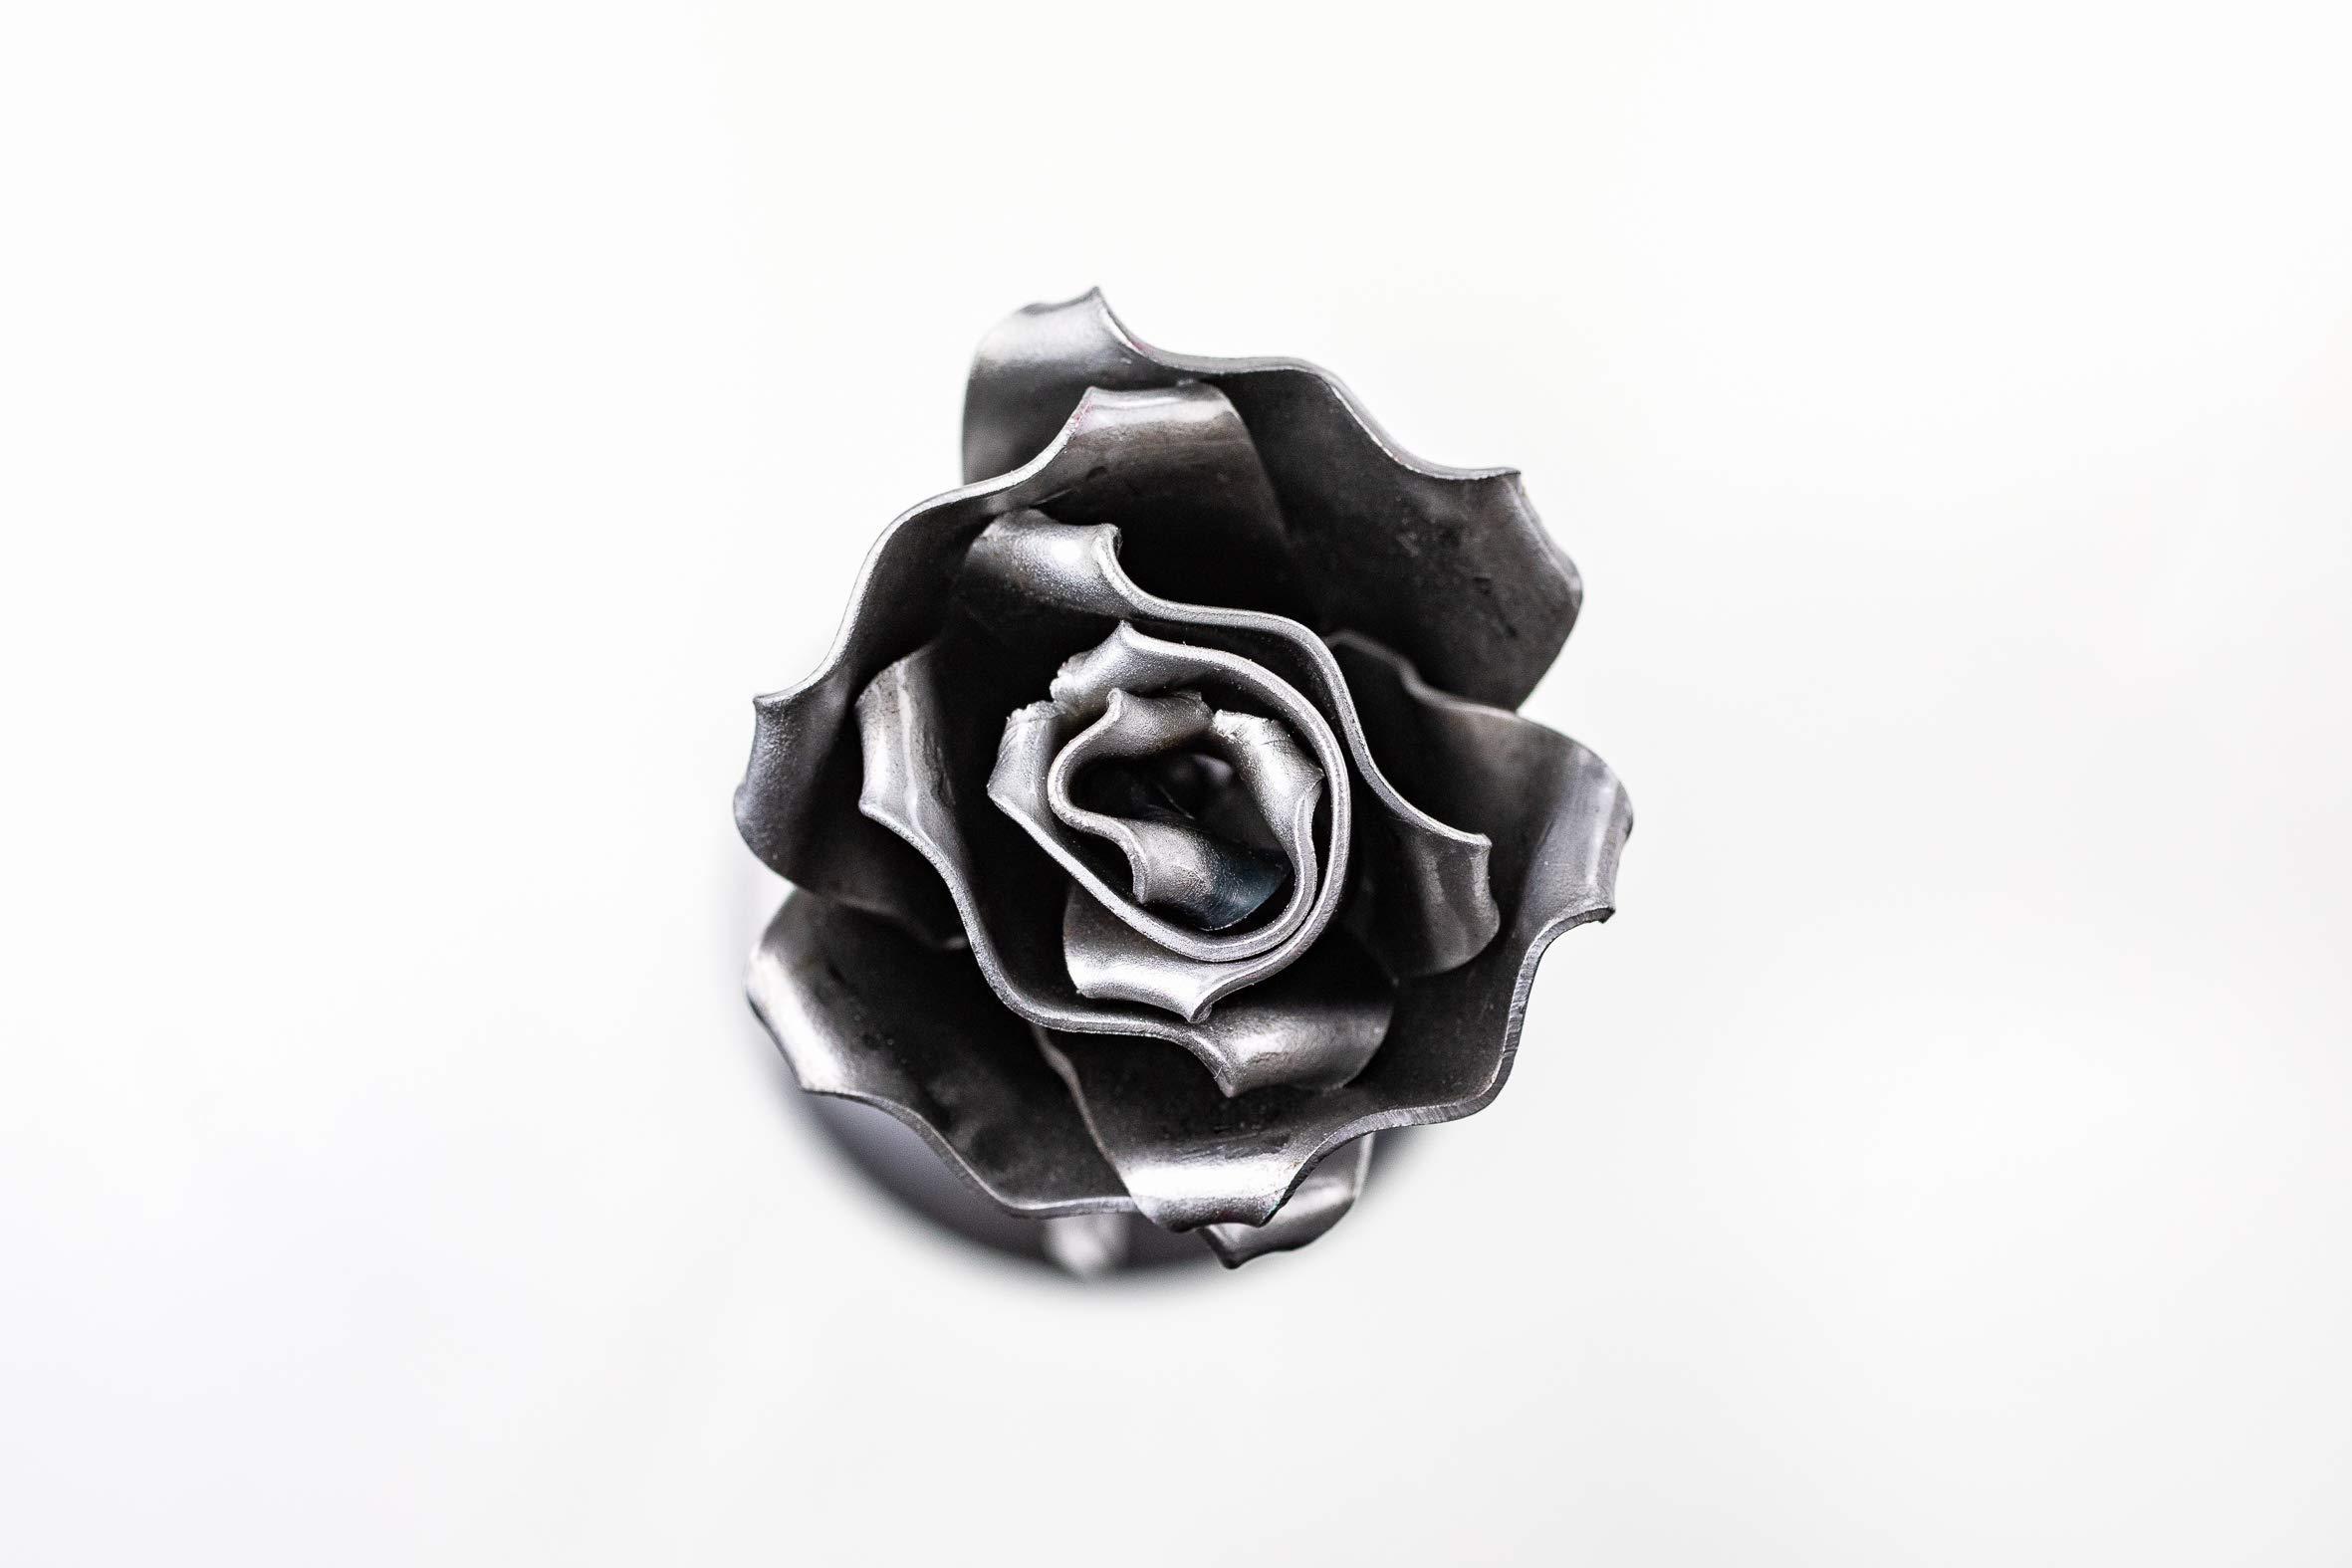 Rosa Eterna de Hierro Forjado Plateada – Forjada a Mano